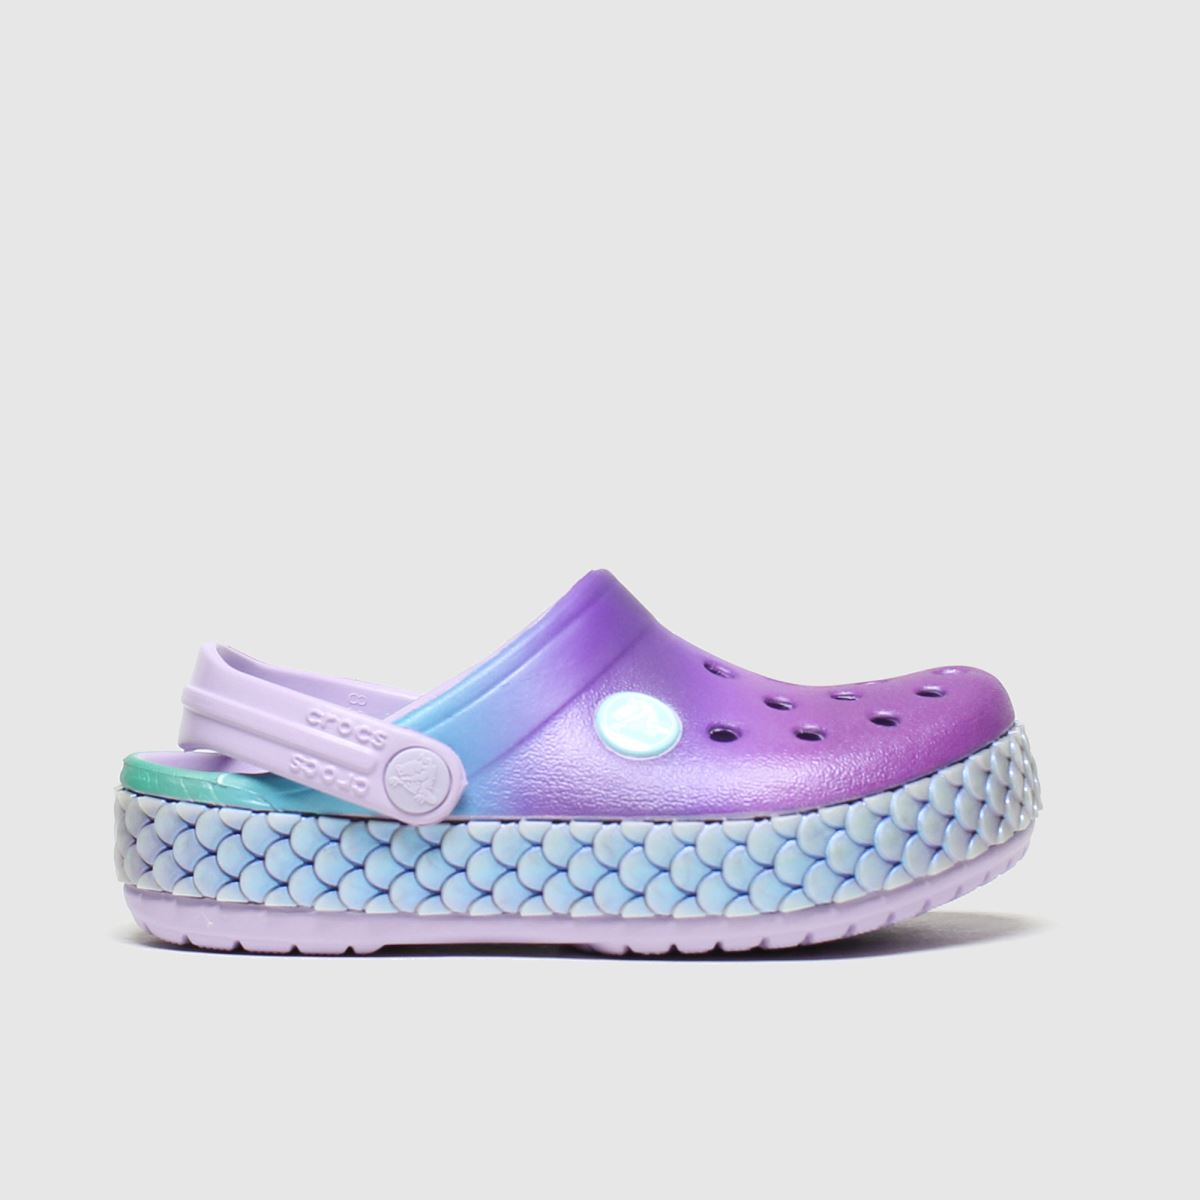 Crocs Crocs Purple Crocband Mermaid Sandals Toddler